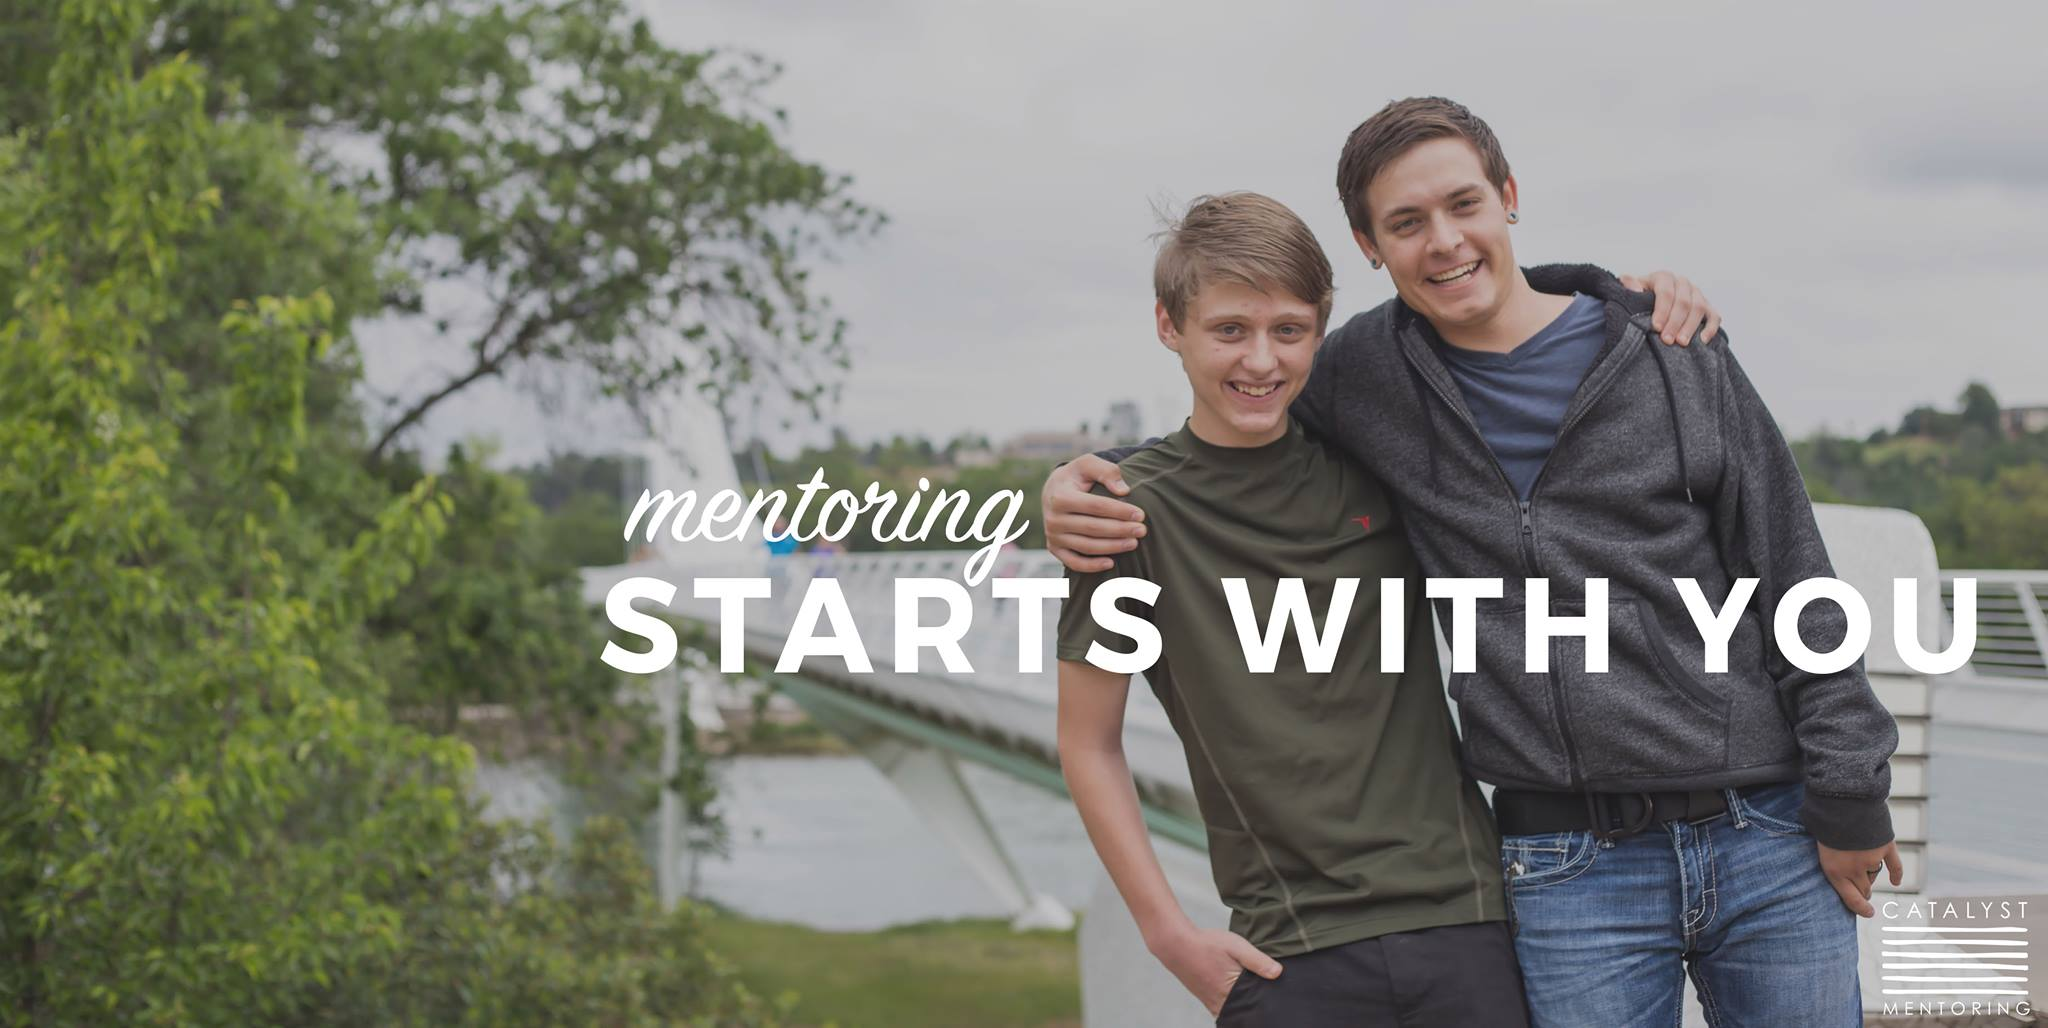 Catalyst Mentoring | Redding Health Expo, Redding CA Health and Wellness Show